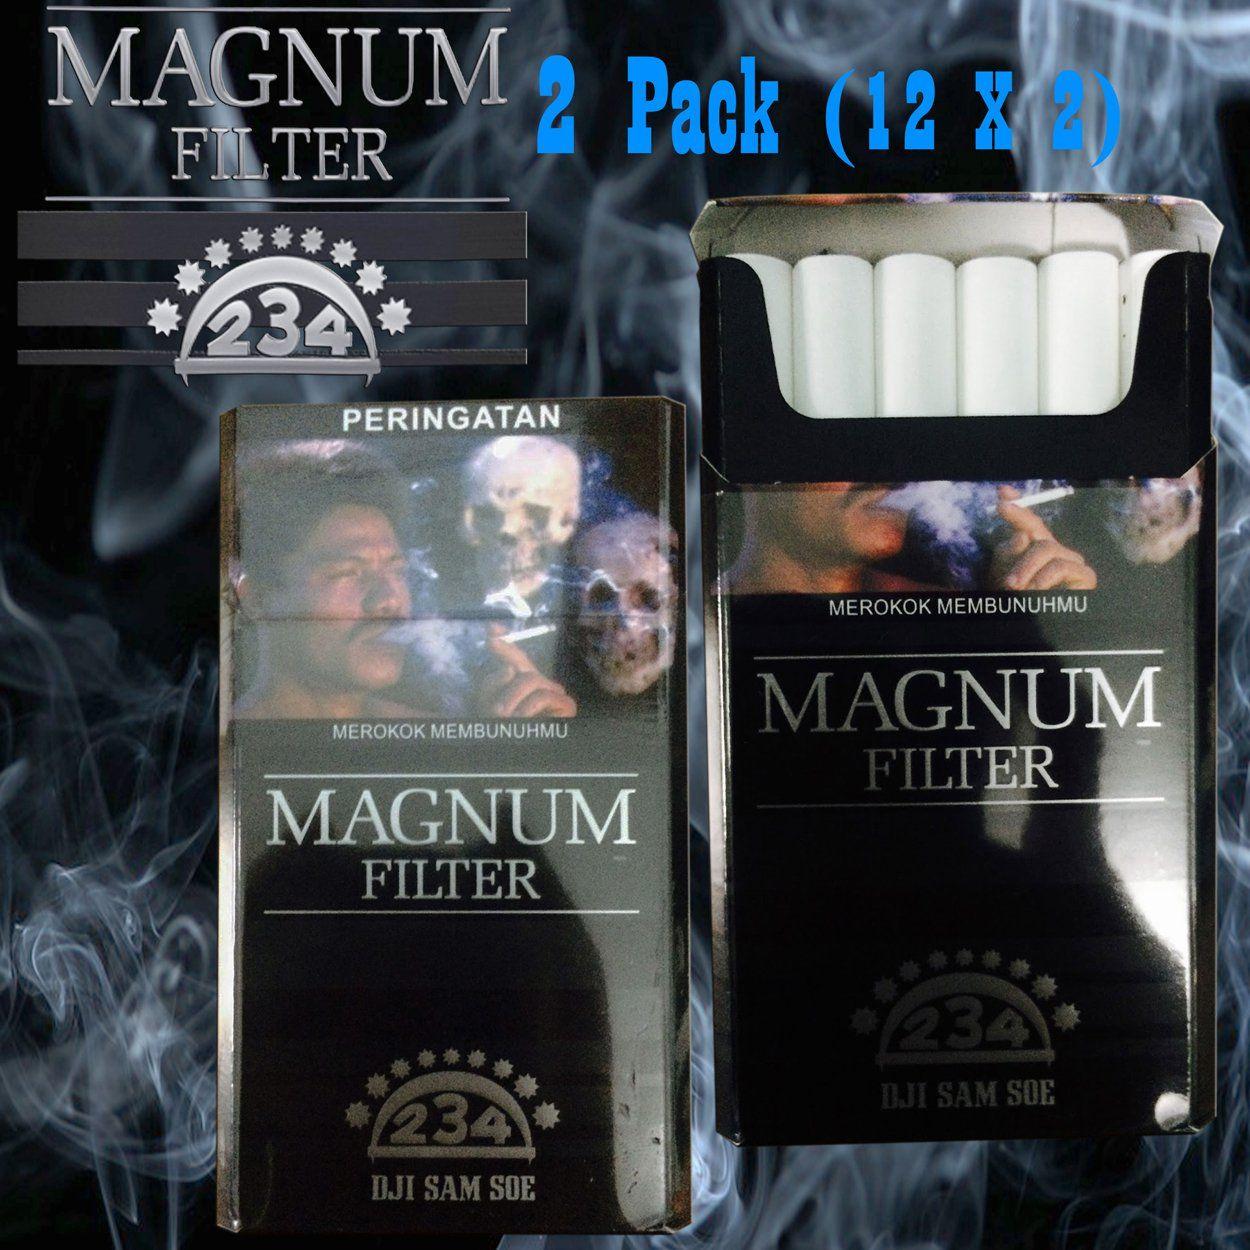 Harga Jual Dji Sam Soe Kretek 12 Isi 1slop Magnum 2 Pack 2x12 Filter Newfresh Sealed